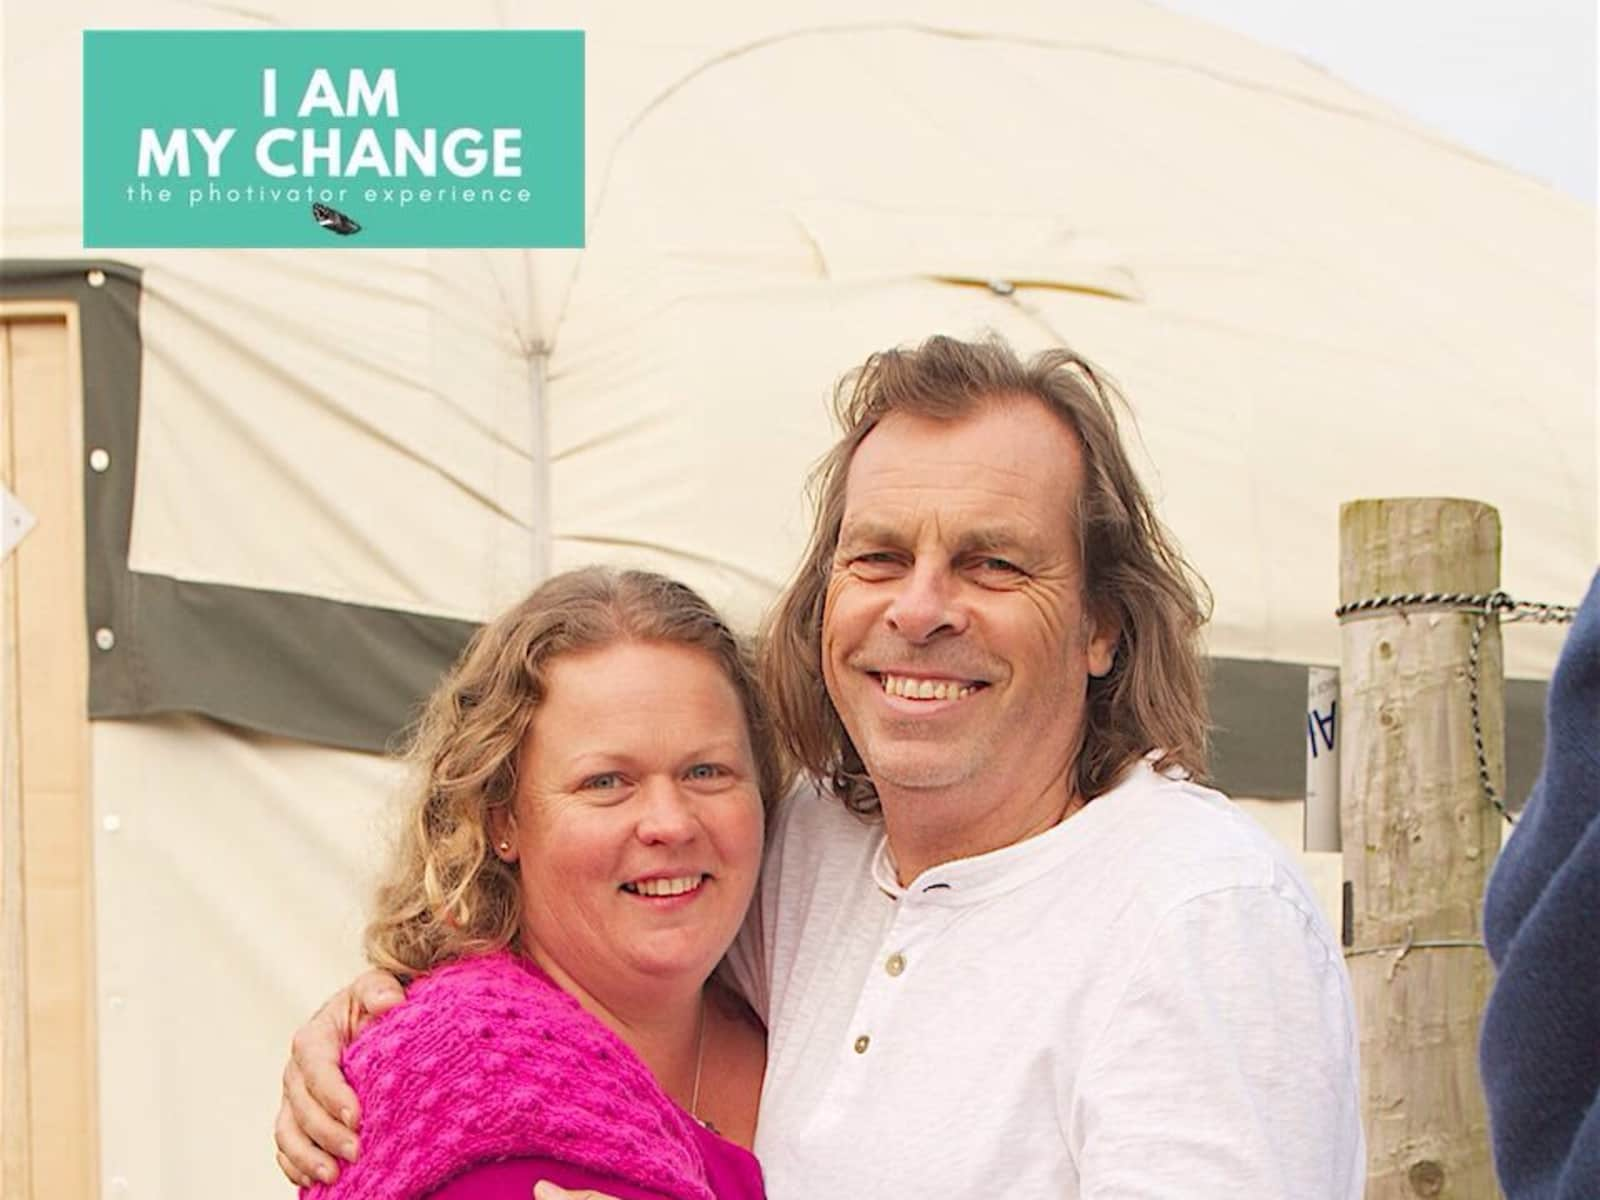 Kirsten & Alistair from Deddington, United Kingdom